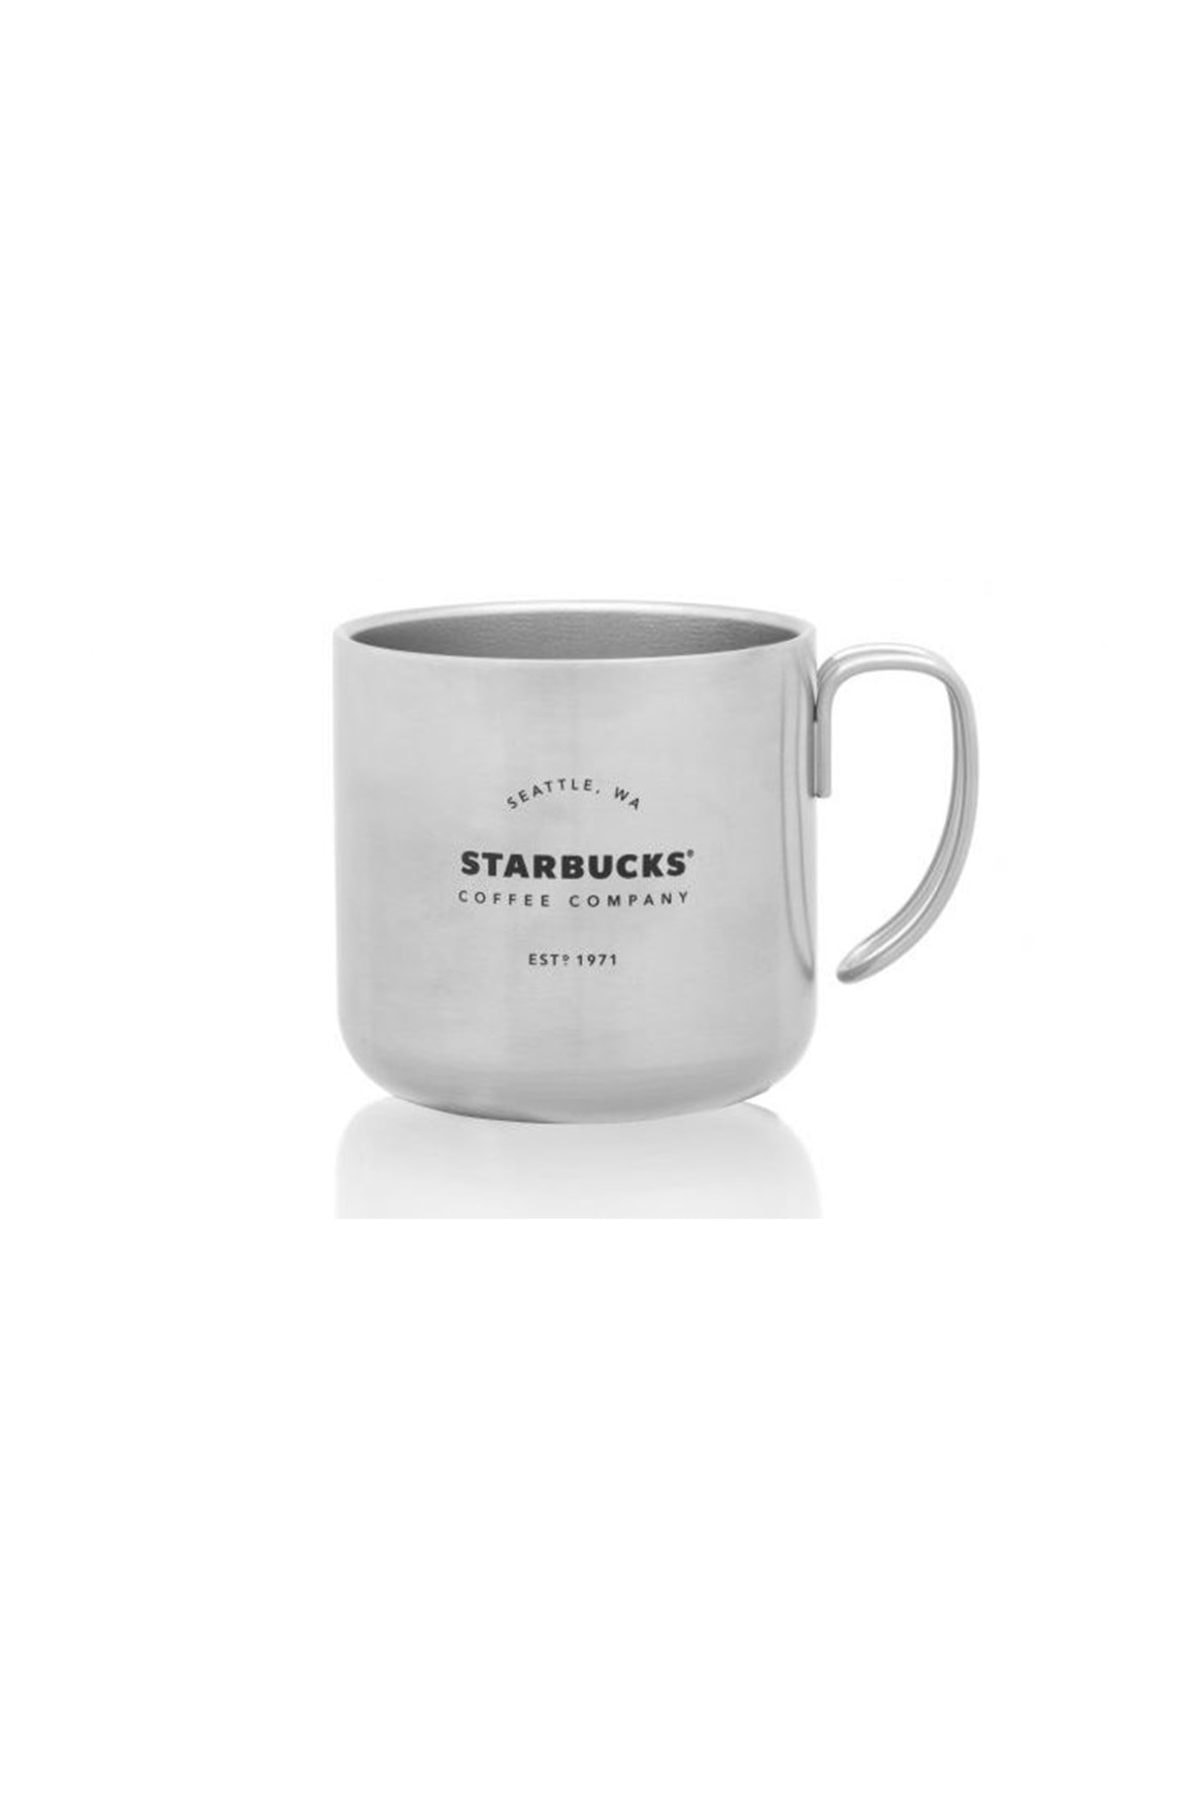 Starbucks Beyaz Metal Termos Bardak Kupa Yılbaşı Serisi 1